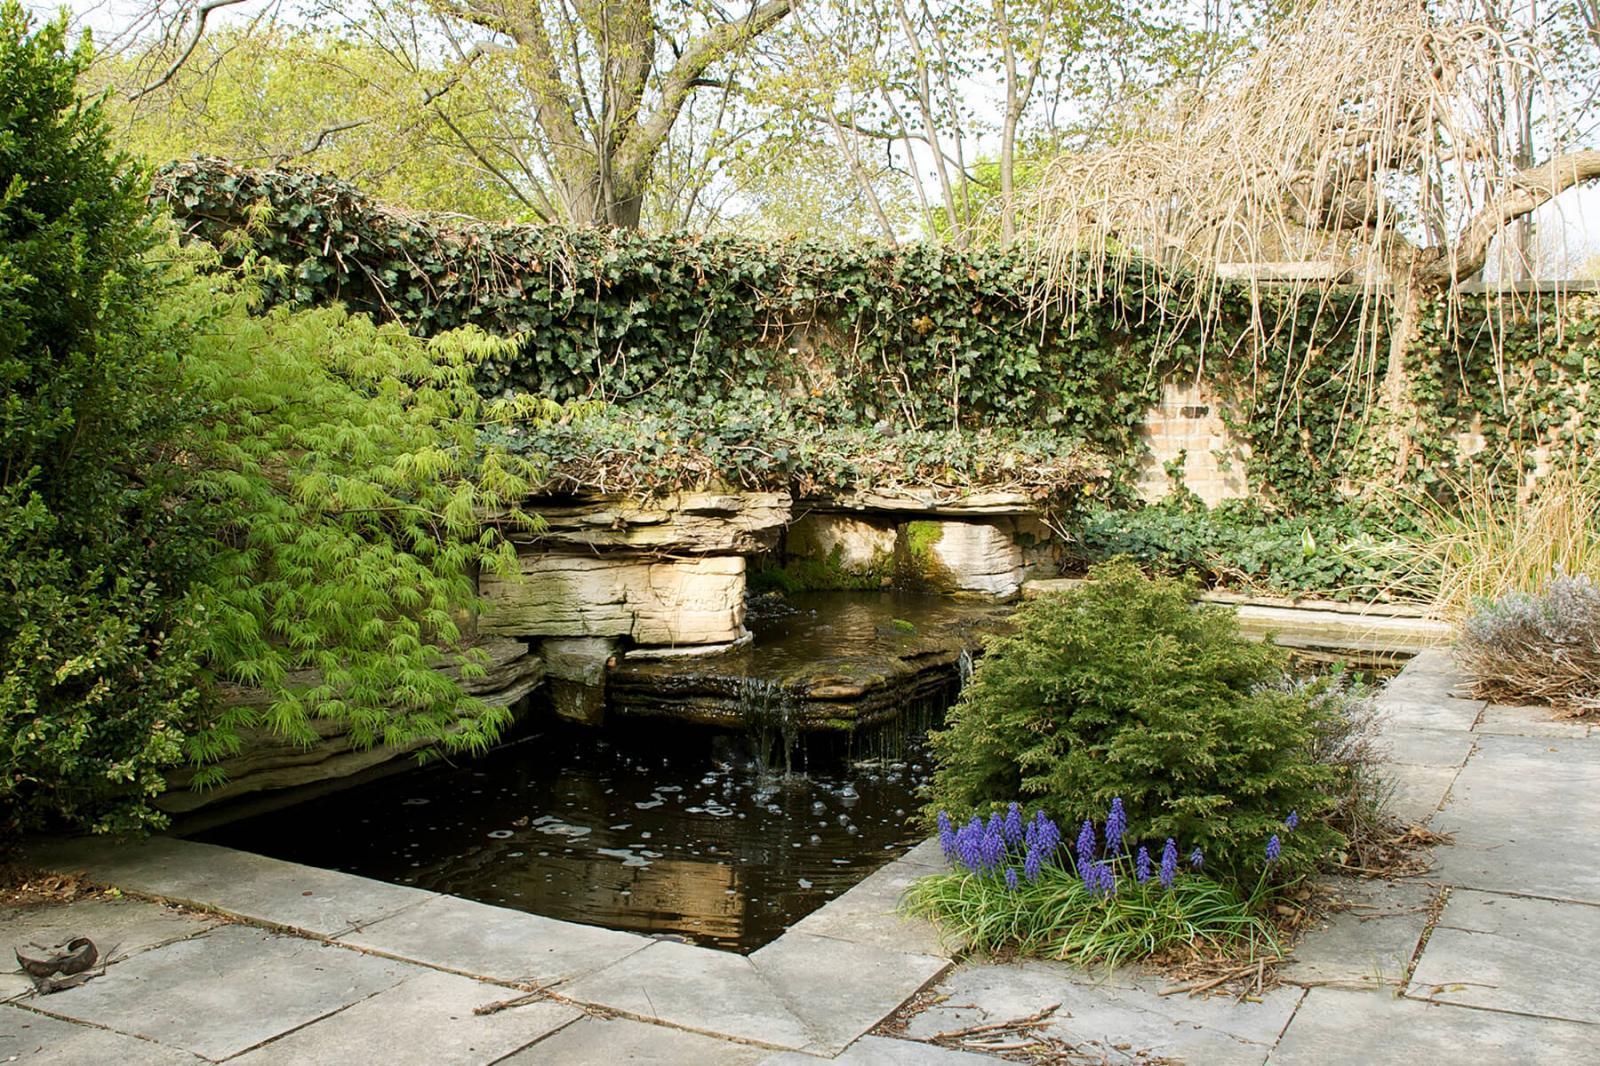 Cuddy Gardens was recently granted botanical gardens status.